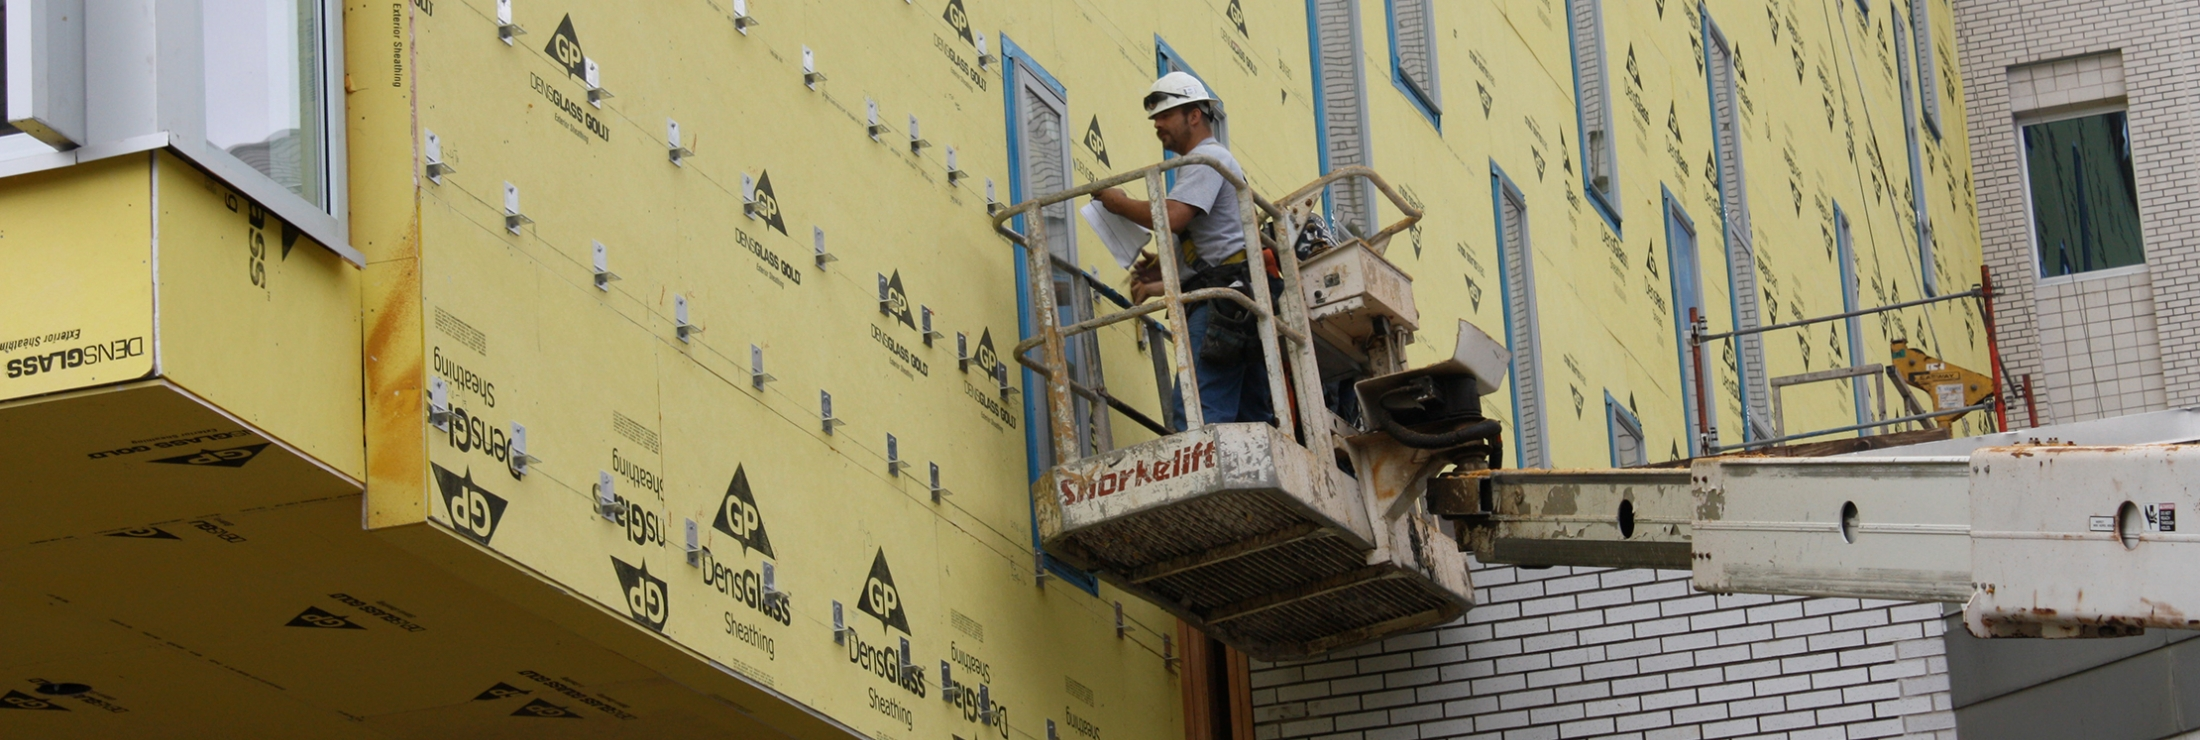 Cladding Corp ECO Cladding Wall Bracket Installation Elevation